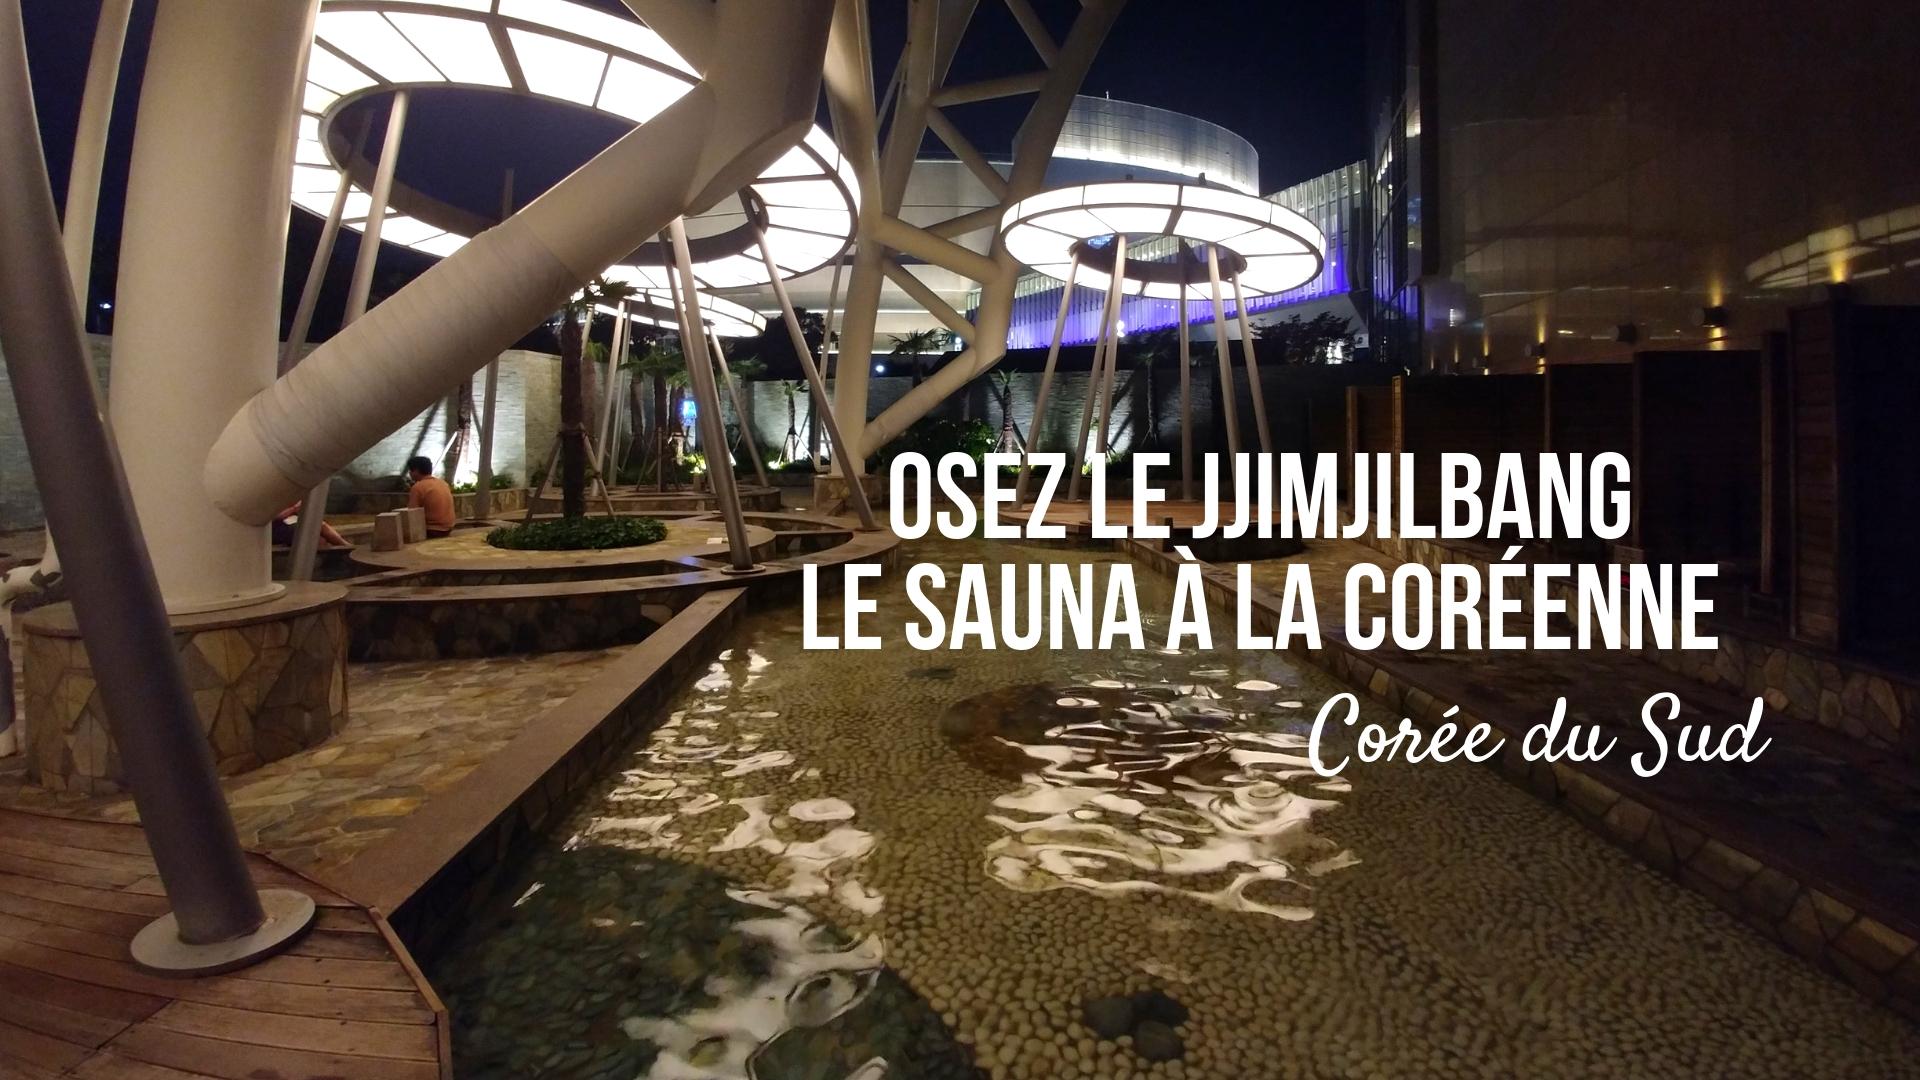 titre jjimjilbang sauna coree seoul busan blog voyage asie arpenter le chemin